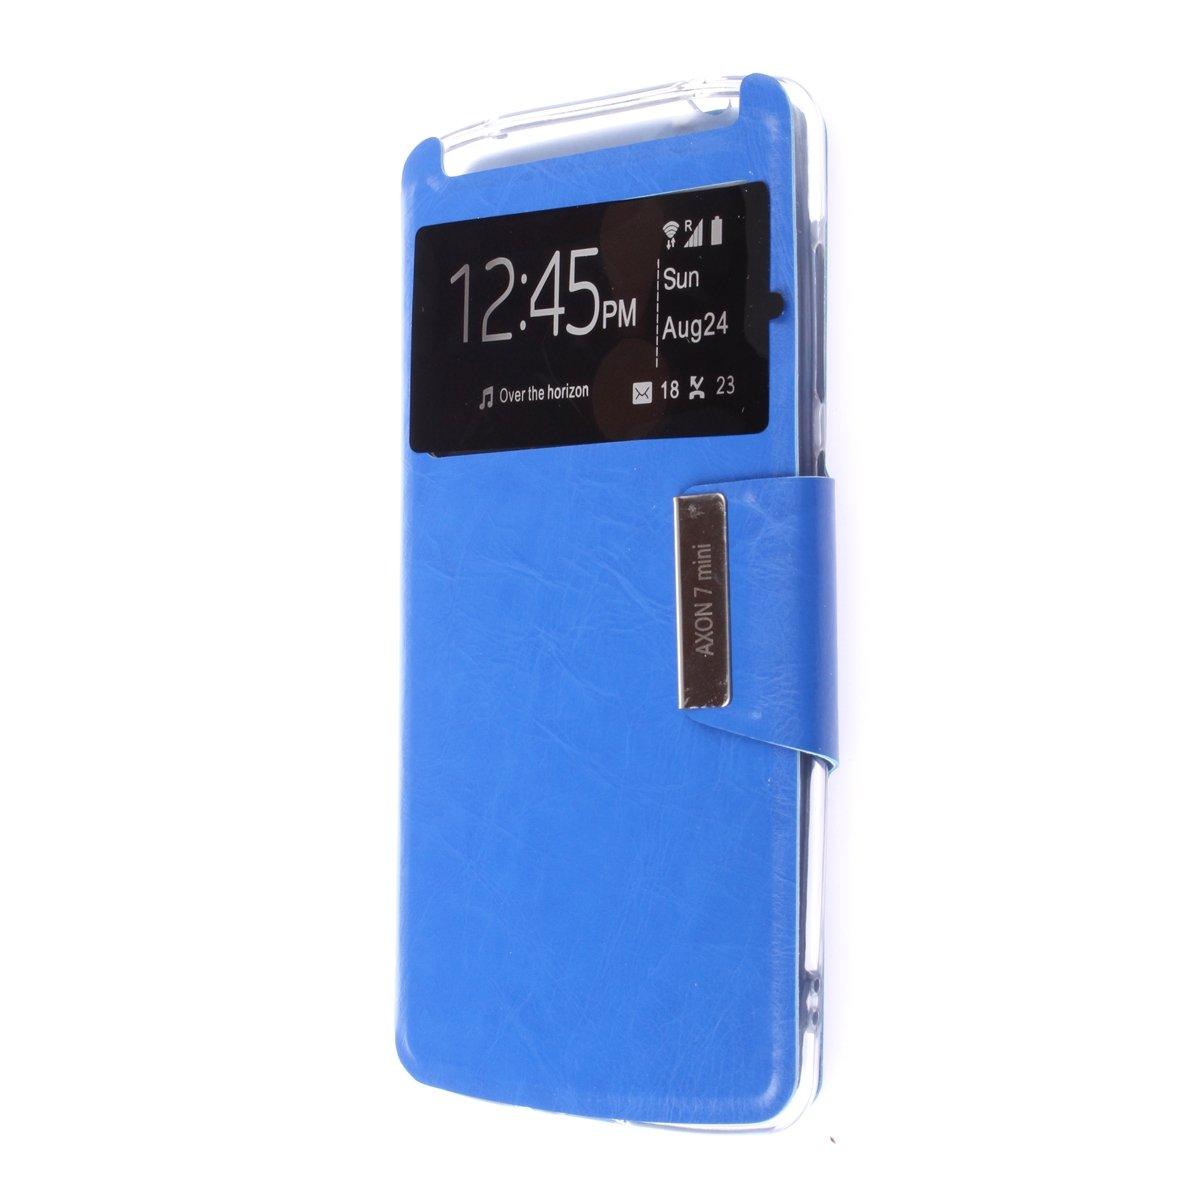 MISEMIYA - Carcasa para ZTE Axon 7 Mini: Amazon.es: Electrónica